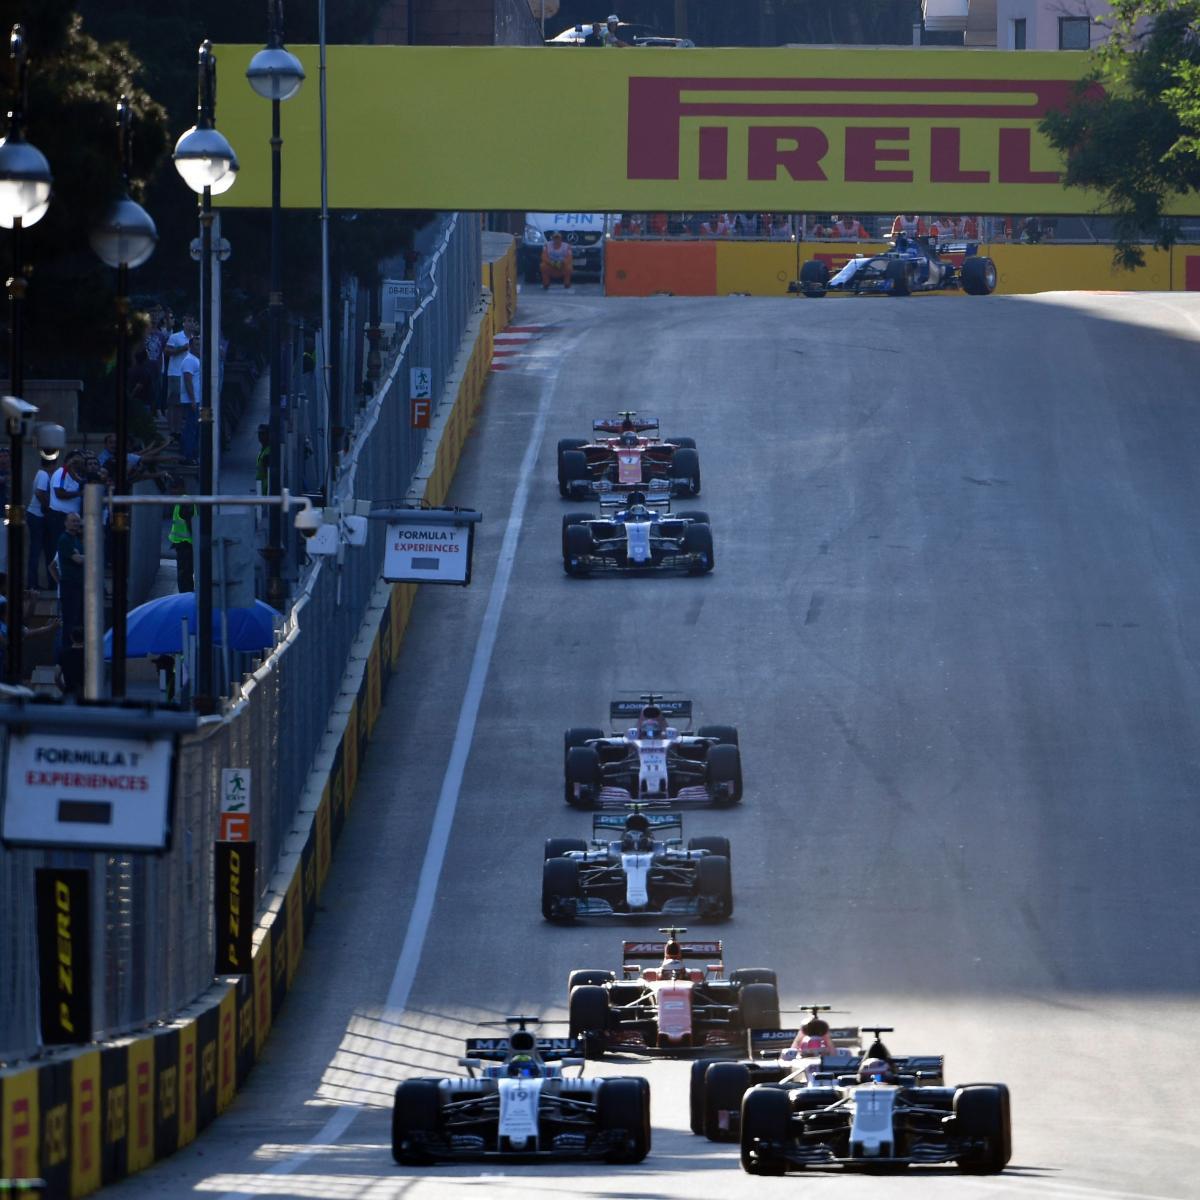 Azerbaijan News And Scores: Azerbaijan F1 Grand Prix 2017 Results: Daniel Ricciardo